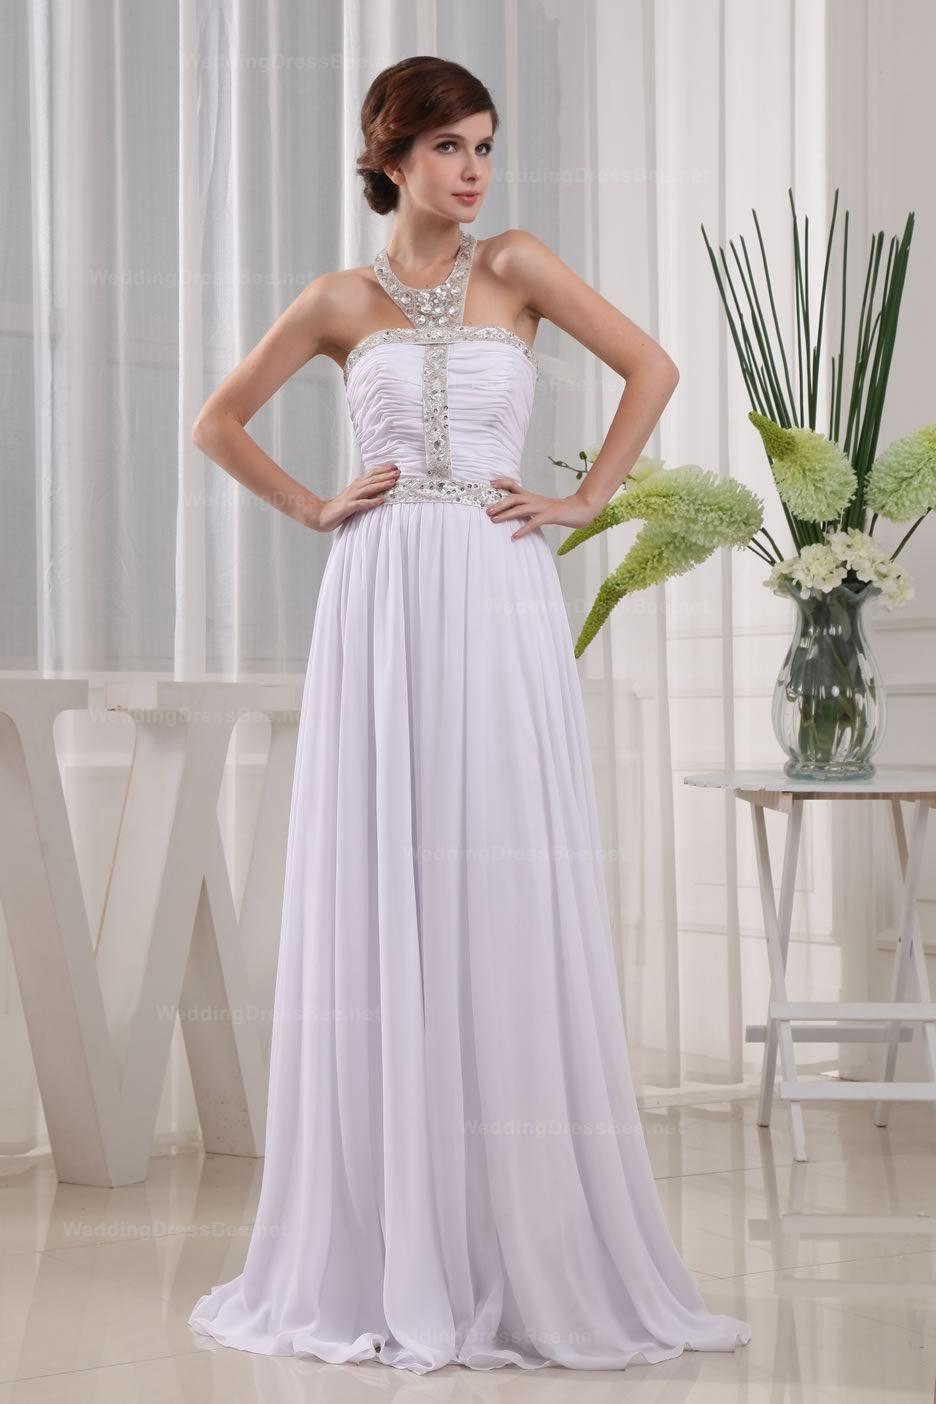 Lace wedding dress halter  Beaded Halter Neck With Natiral Waist Chiffon Beach Wedding Dress